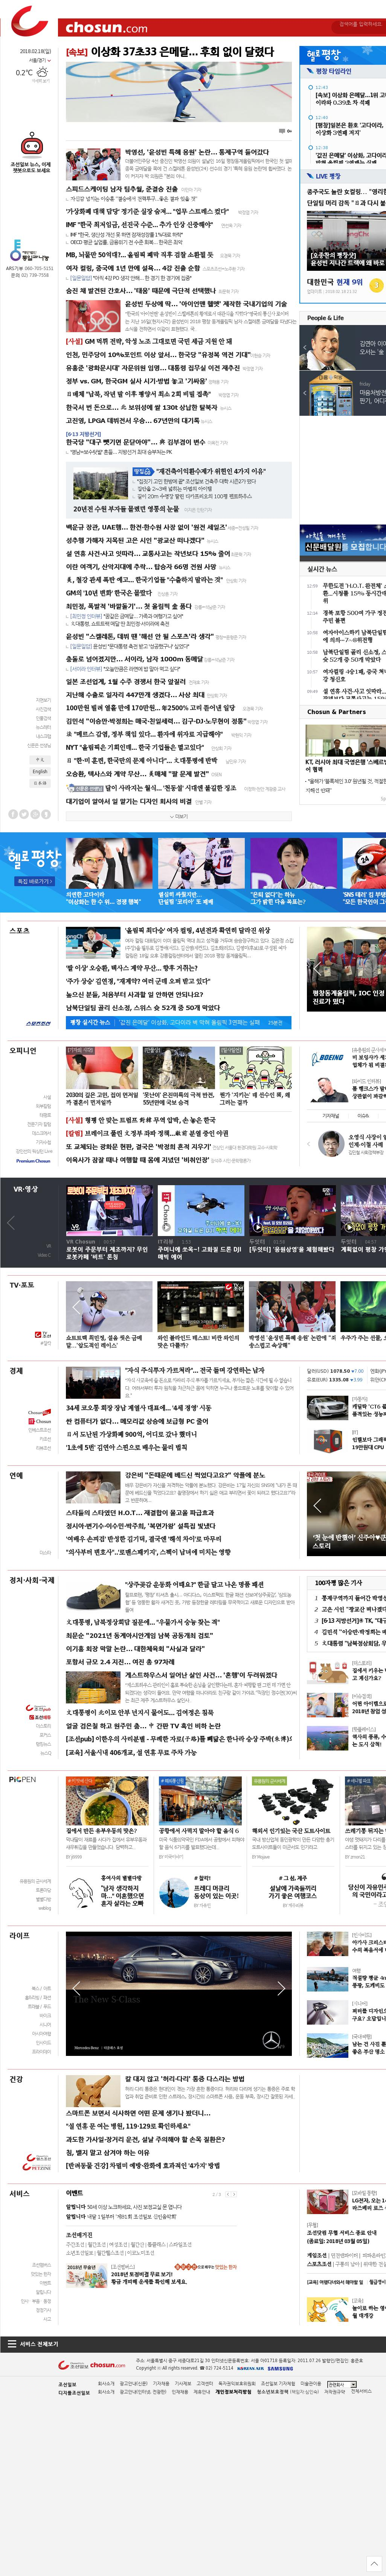 chosun.com at Sunday Feb. 18, 2018, 1:02 p.m. UTC